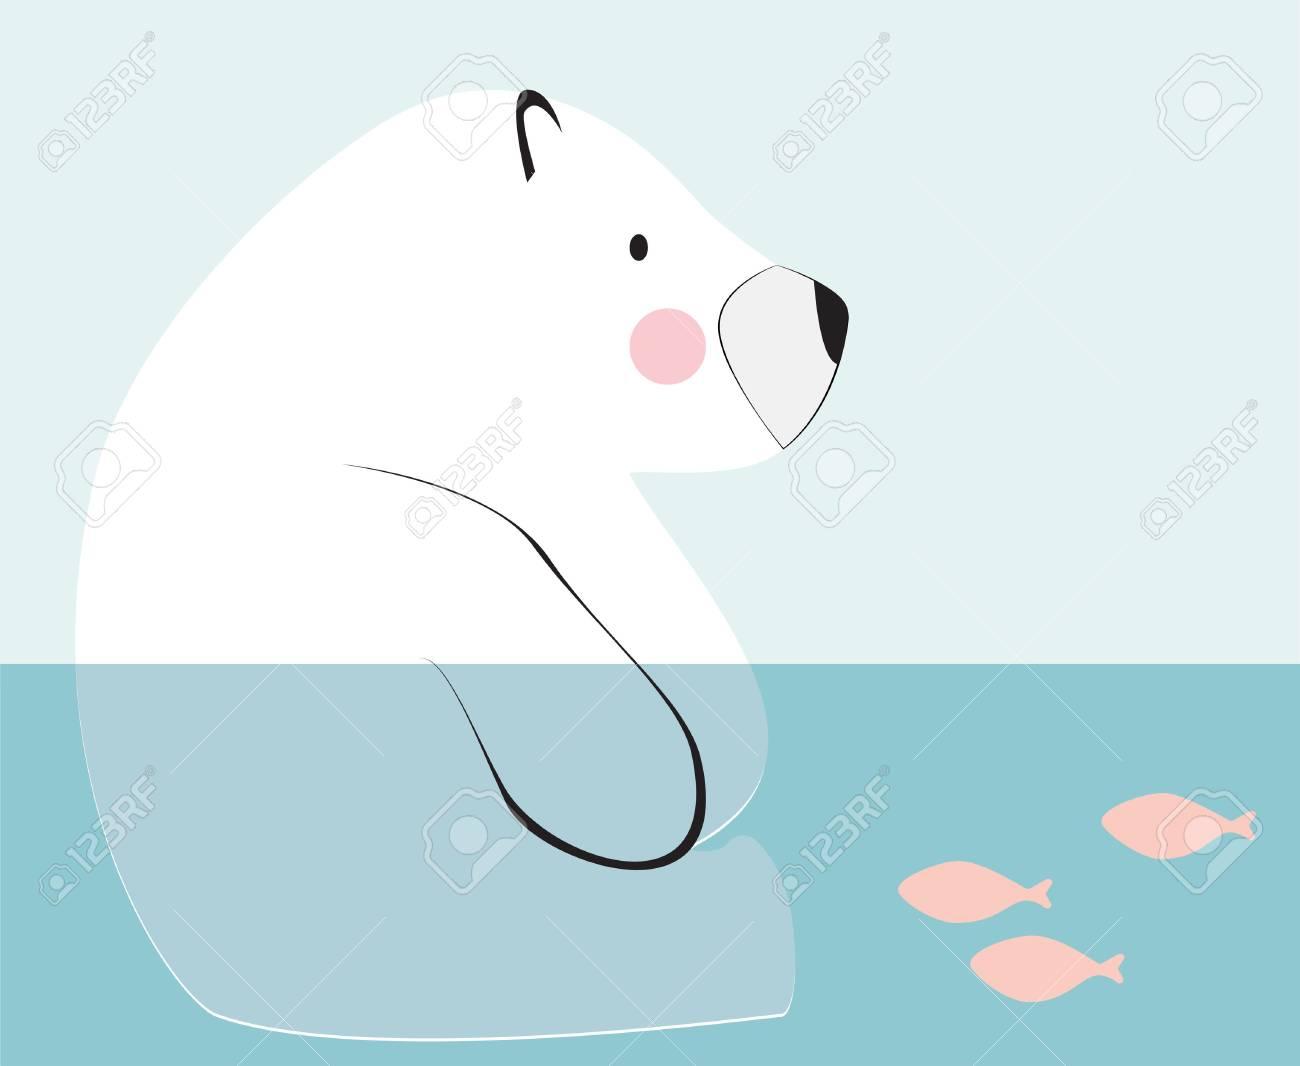 1300x1066 Cute Polar Bear Sitting Down On The Water. Children Drawings